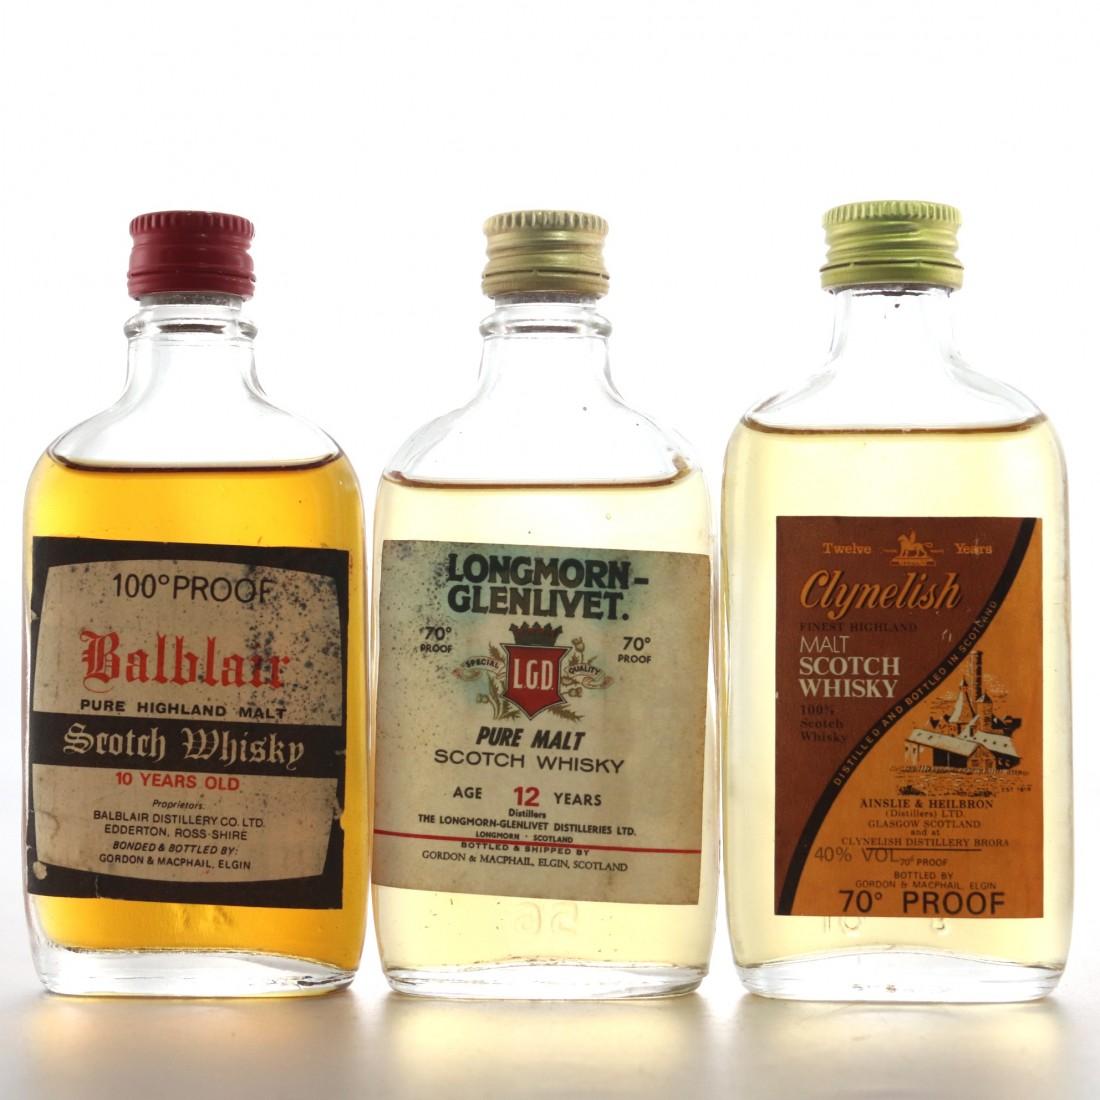 Gordon & MacPhail Miniature Selection 3 x 5cl / including Clynelish Ainslie